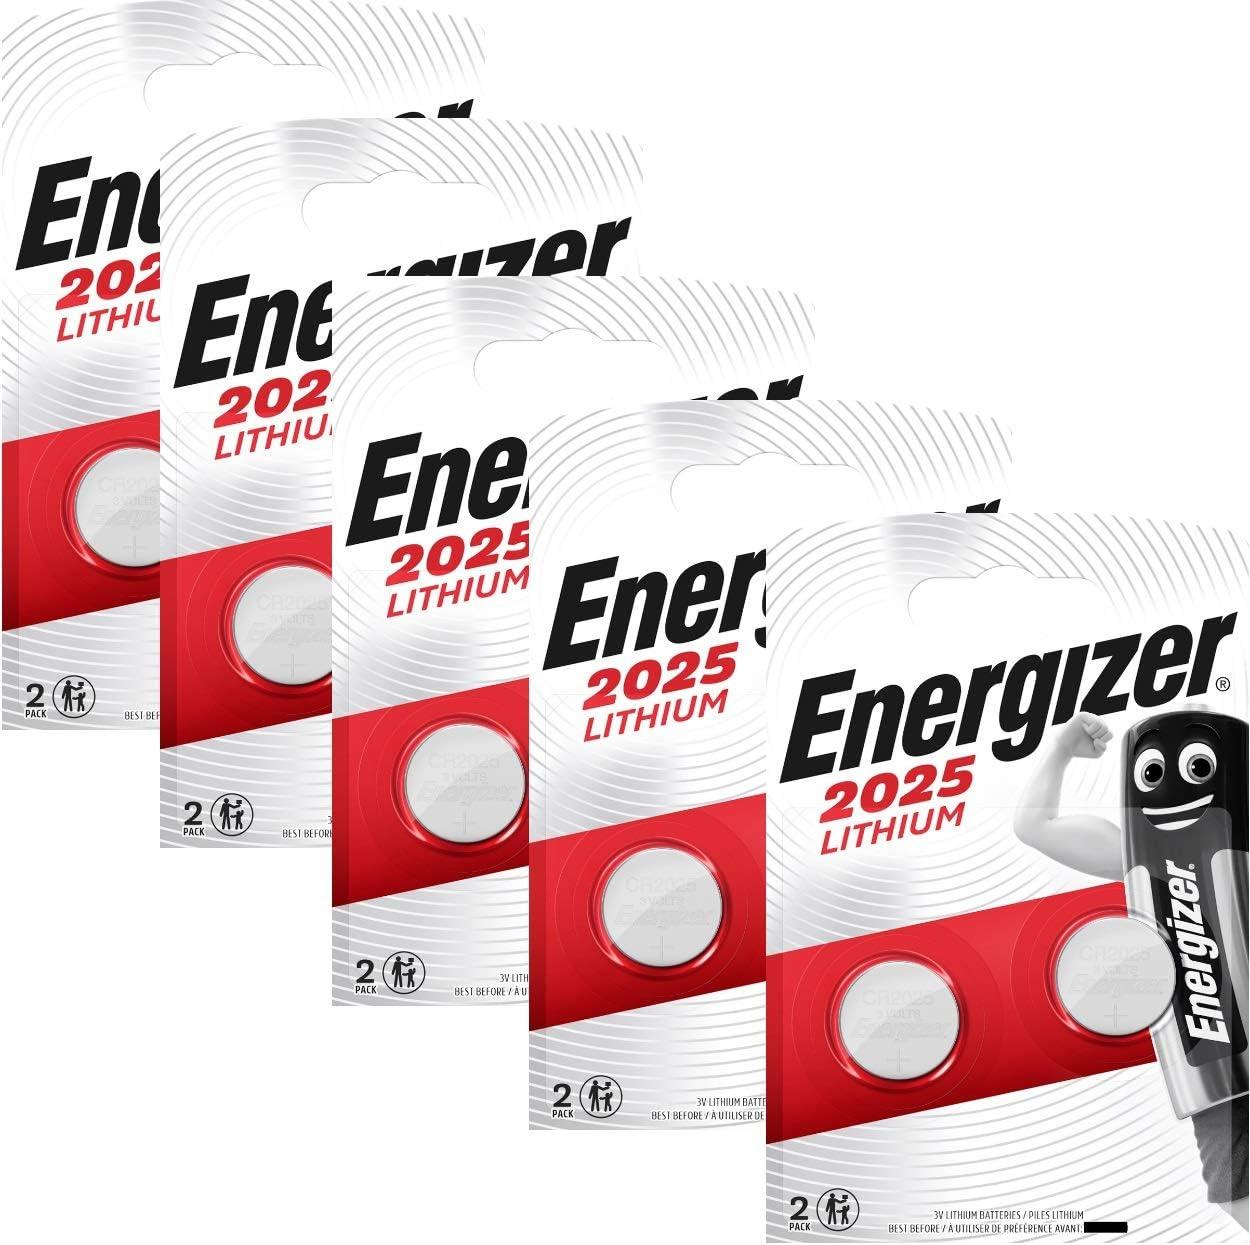 Energizer 637988SET - Pilas de botón, Litio CR2025, 3 V, 5 pack de ...